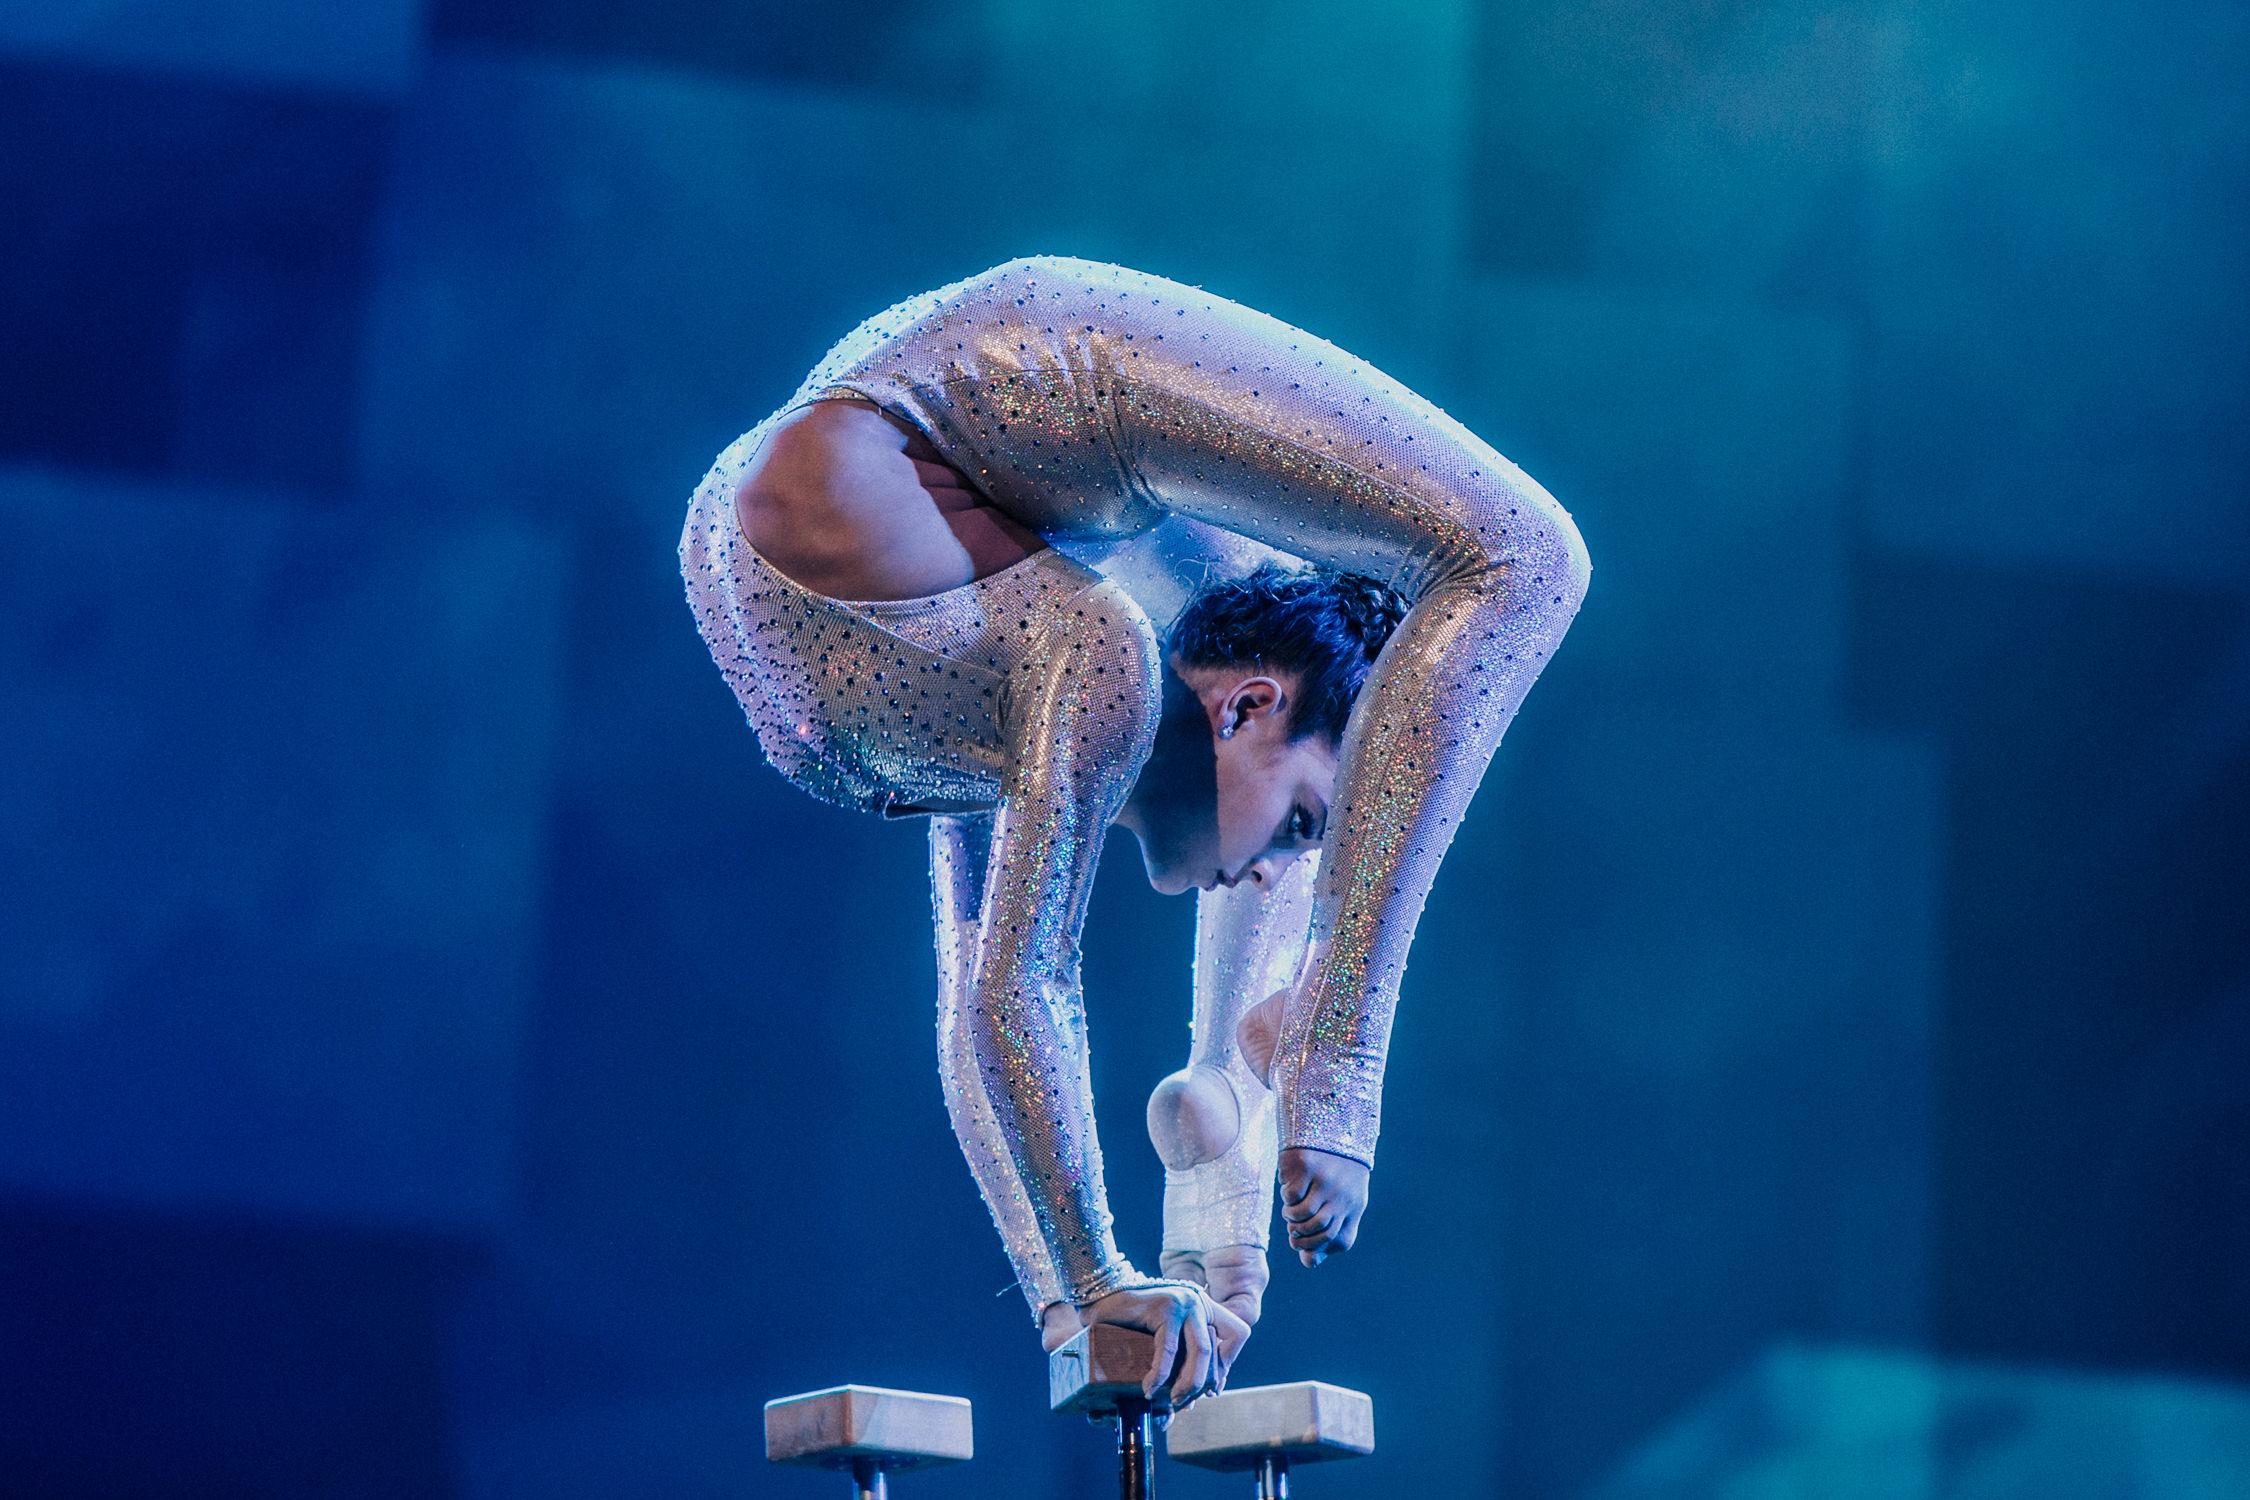 Sofie-Dossi-contortionist-performer-AnnaLeeMedia